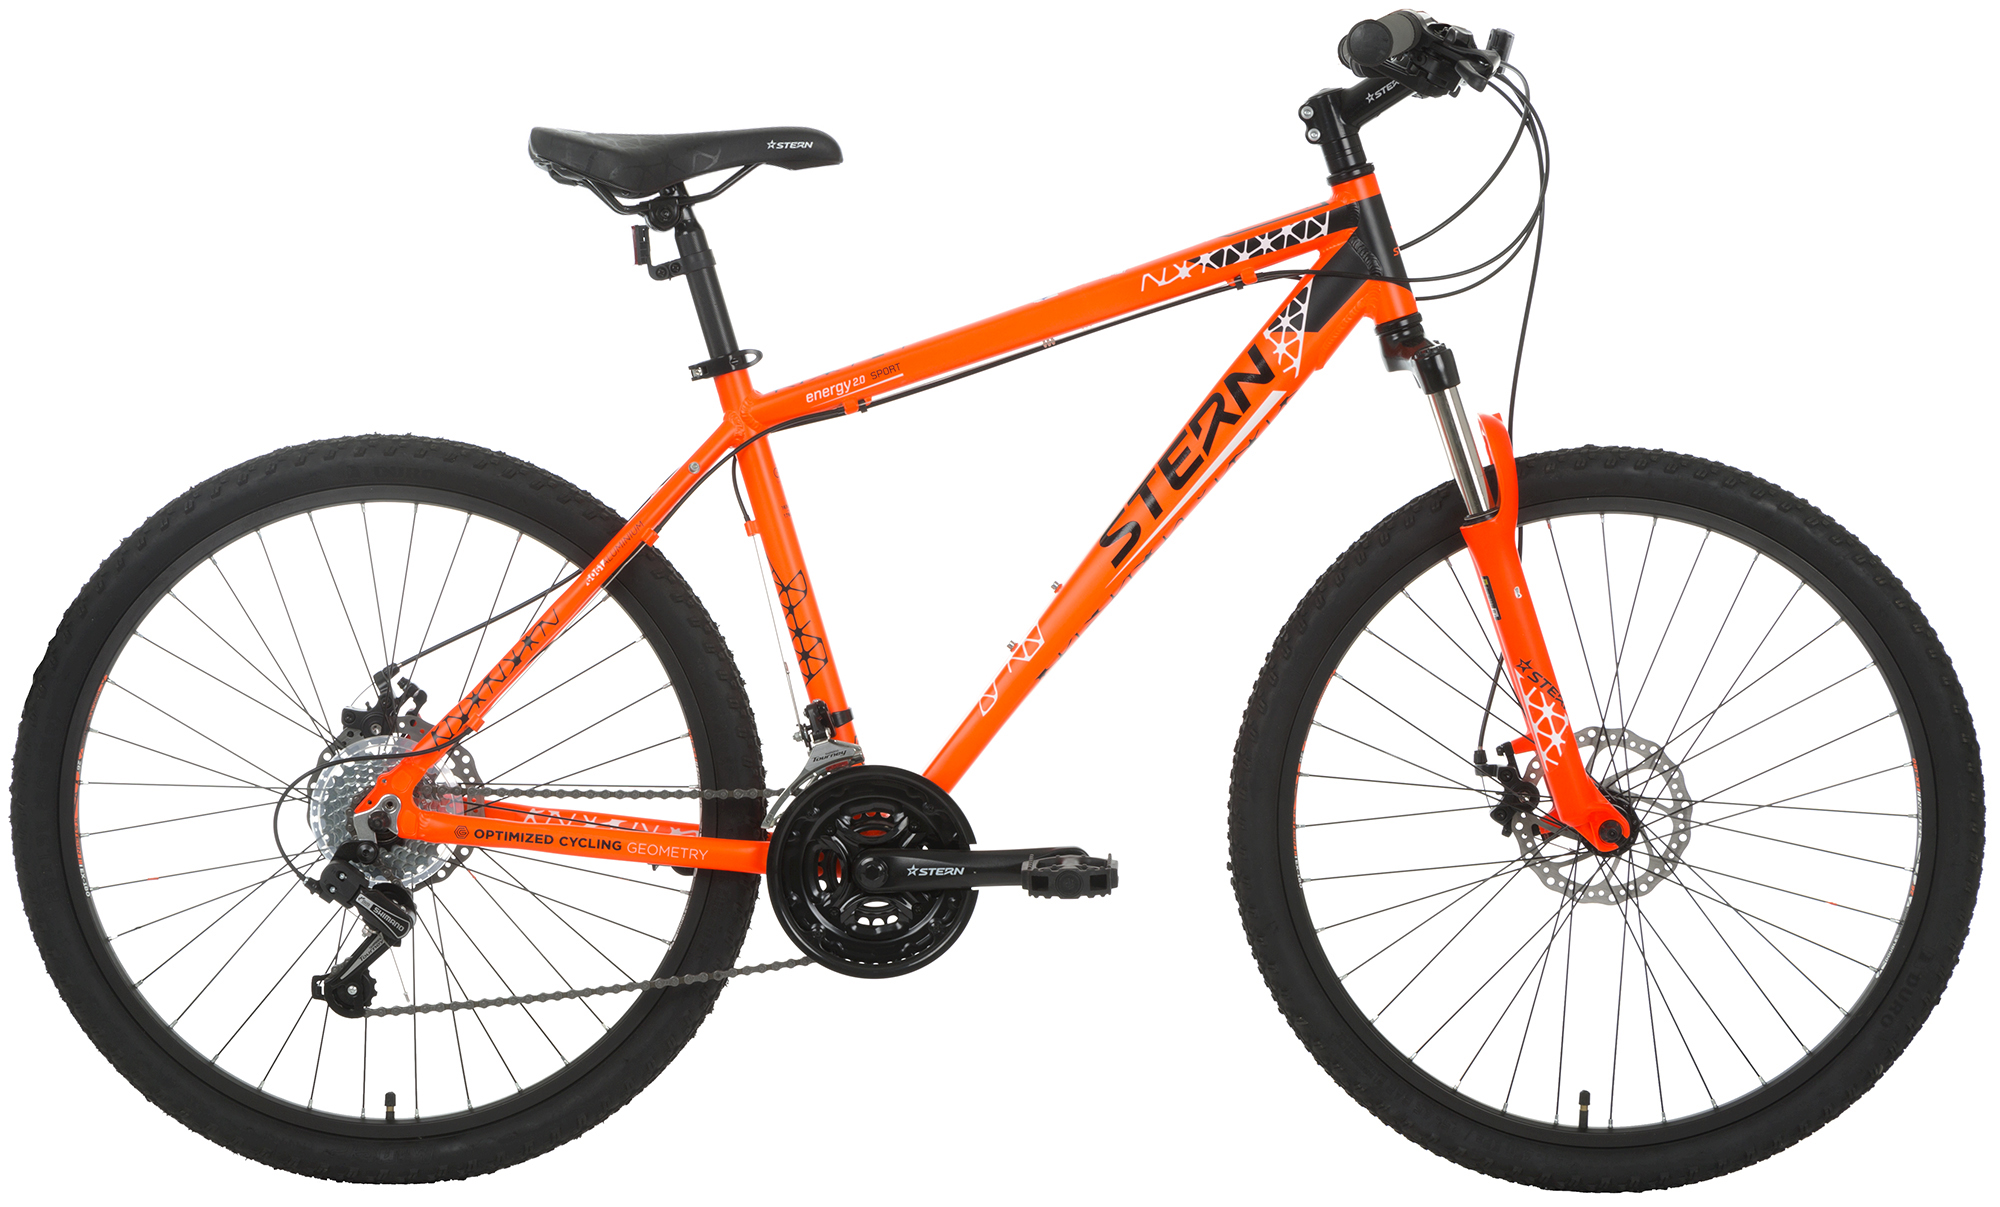 Stern Велосипед горный Stern Energy 2.0 Sport 26 stern велосипед горный stern motion 2 0 27 5